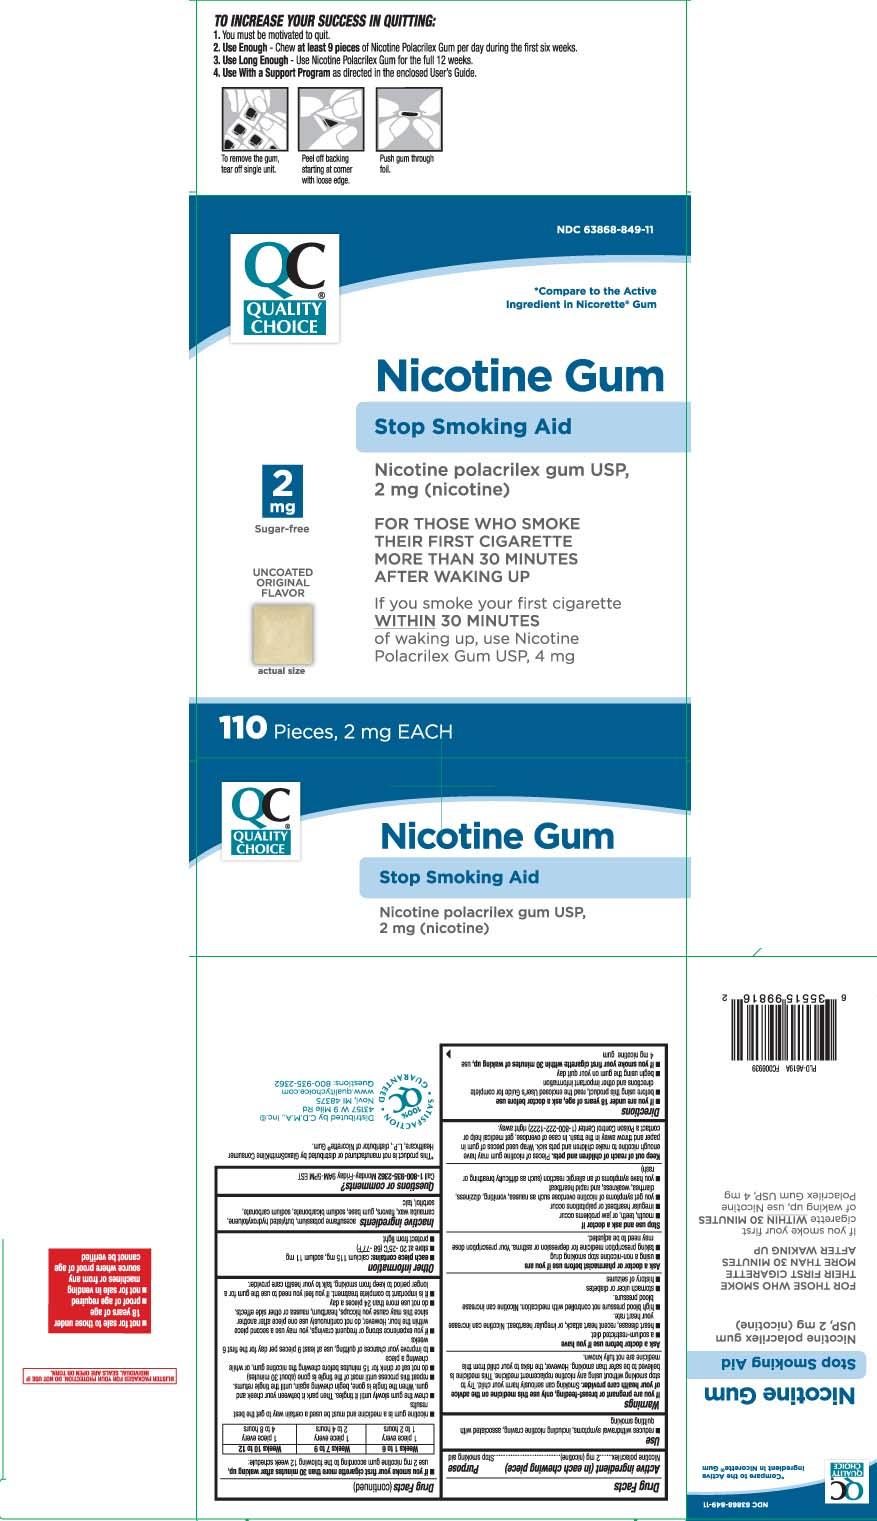 Nicotine Polacrilex 2 mg (nicotine)